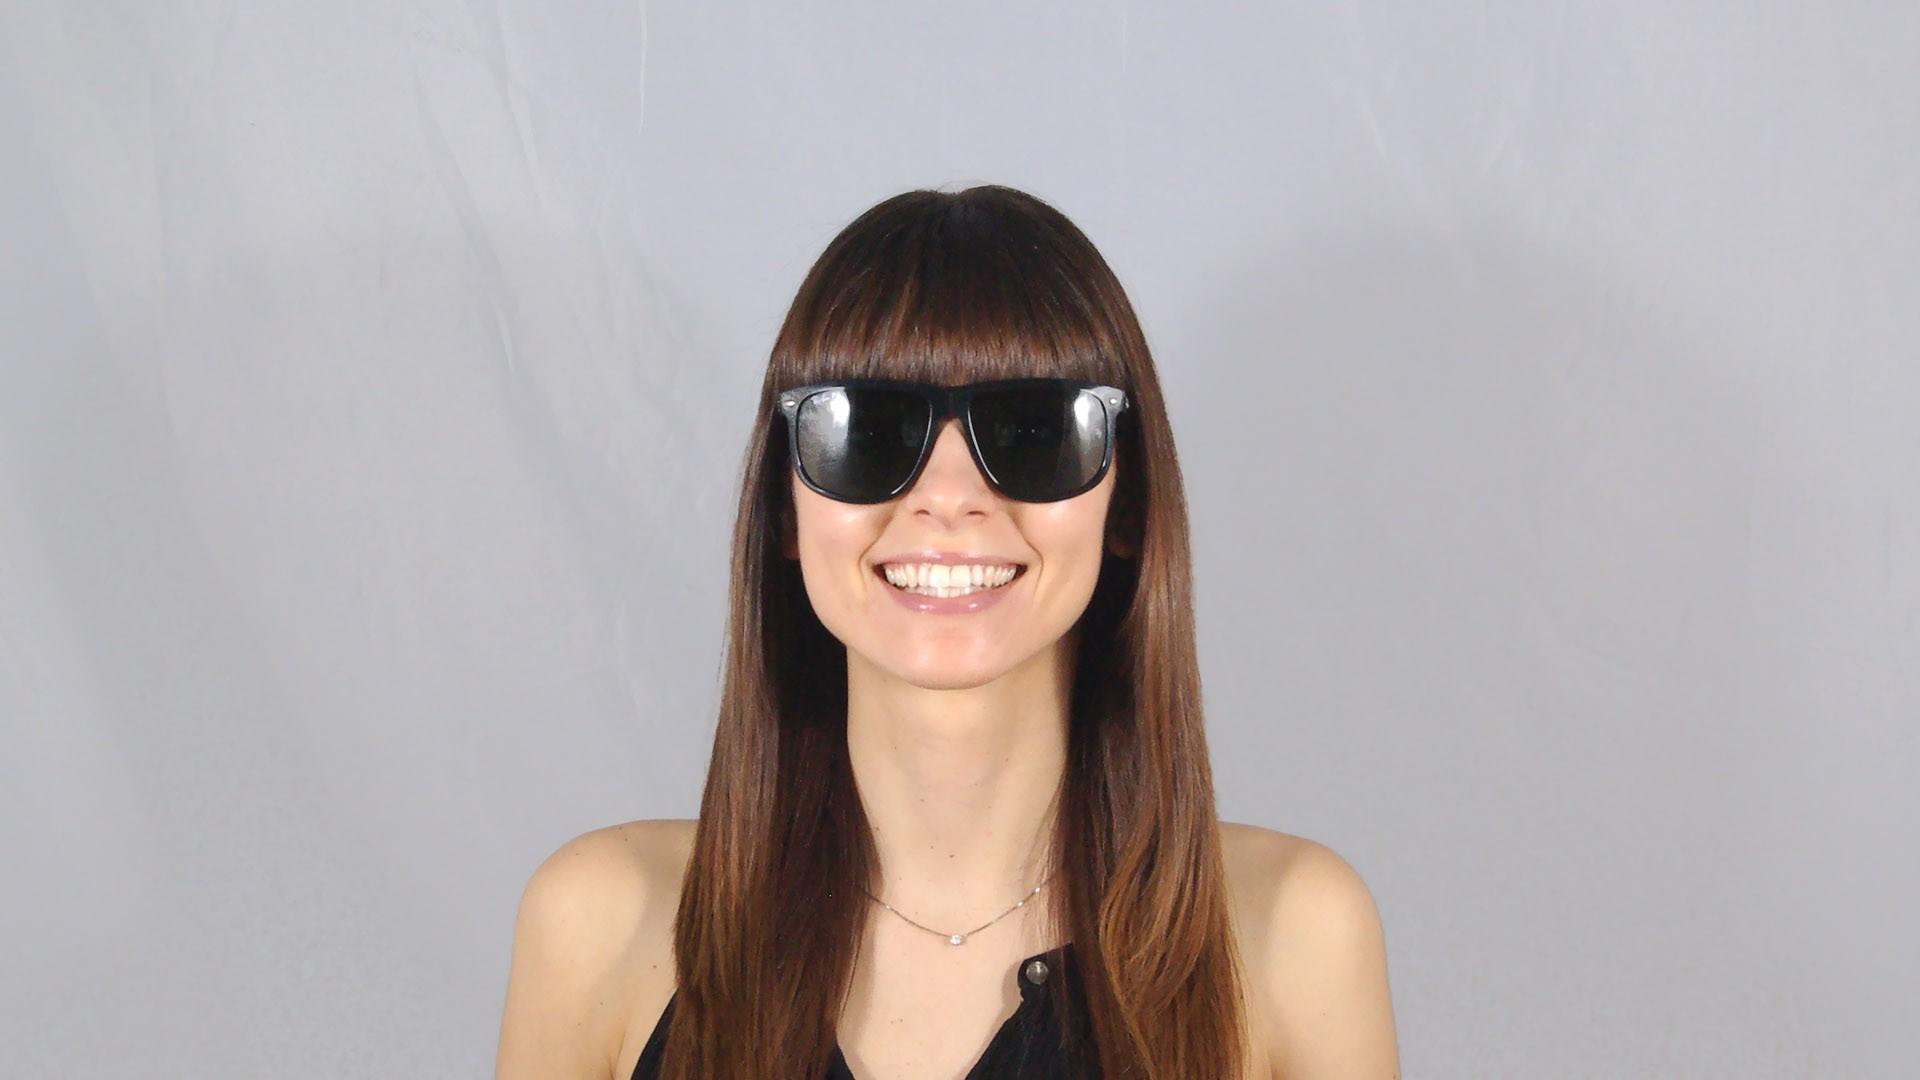 86d8e8009e6a3c Sunglasses Ray-Ban RB4147 601 58 60-15 Black Large Polarized